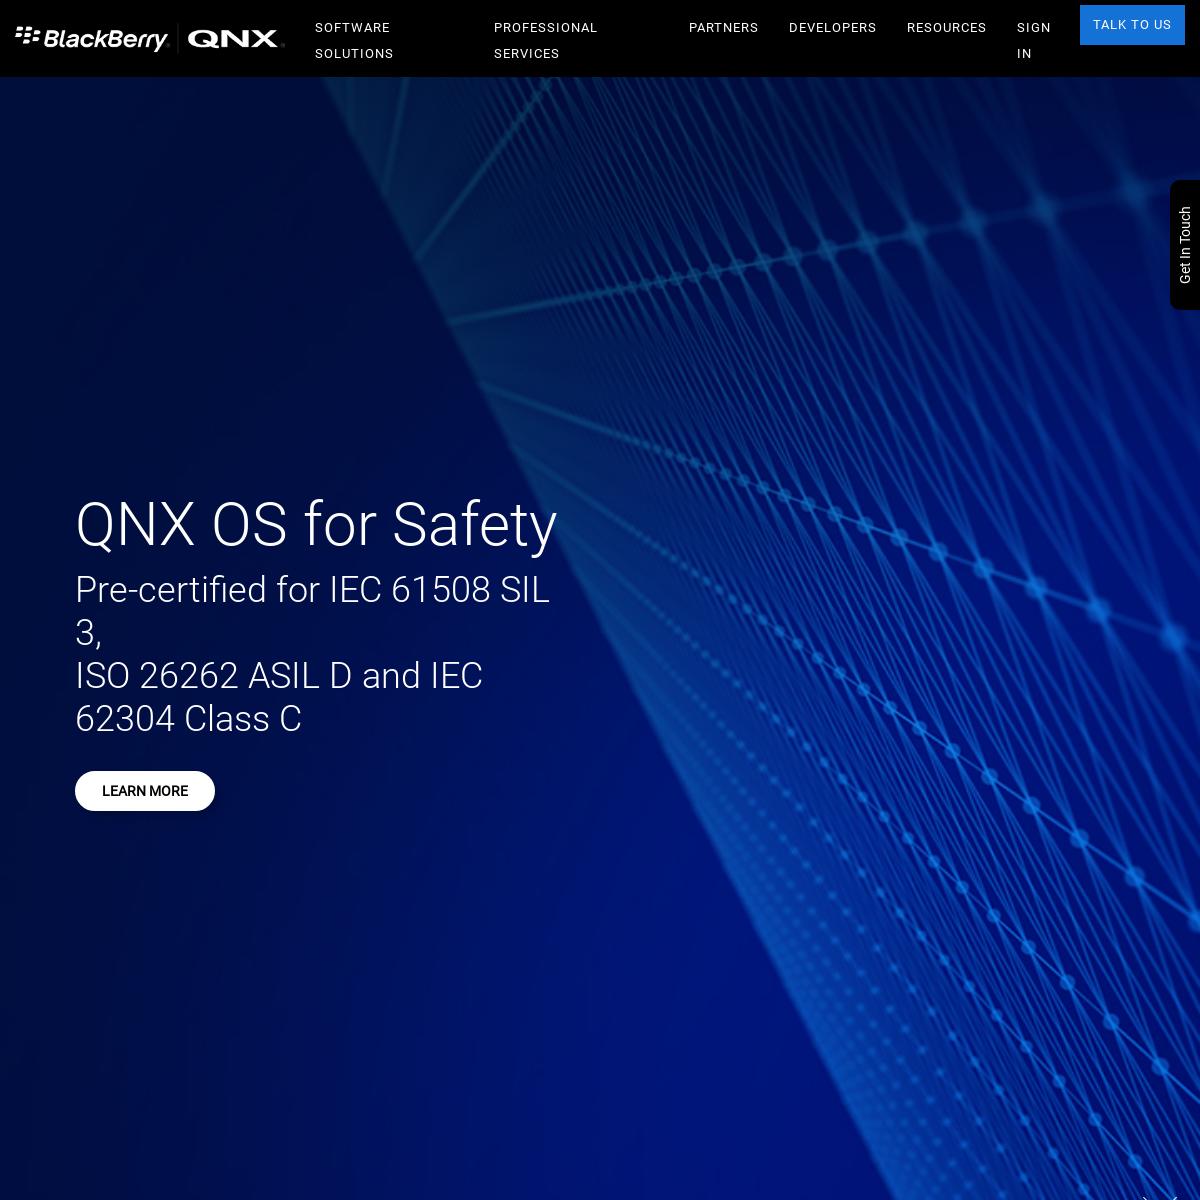 Embedded Systems Software Platform - BlackBerry QNX